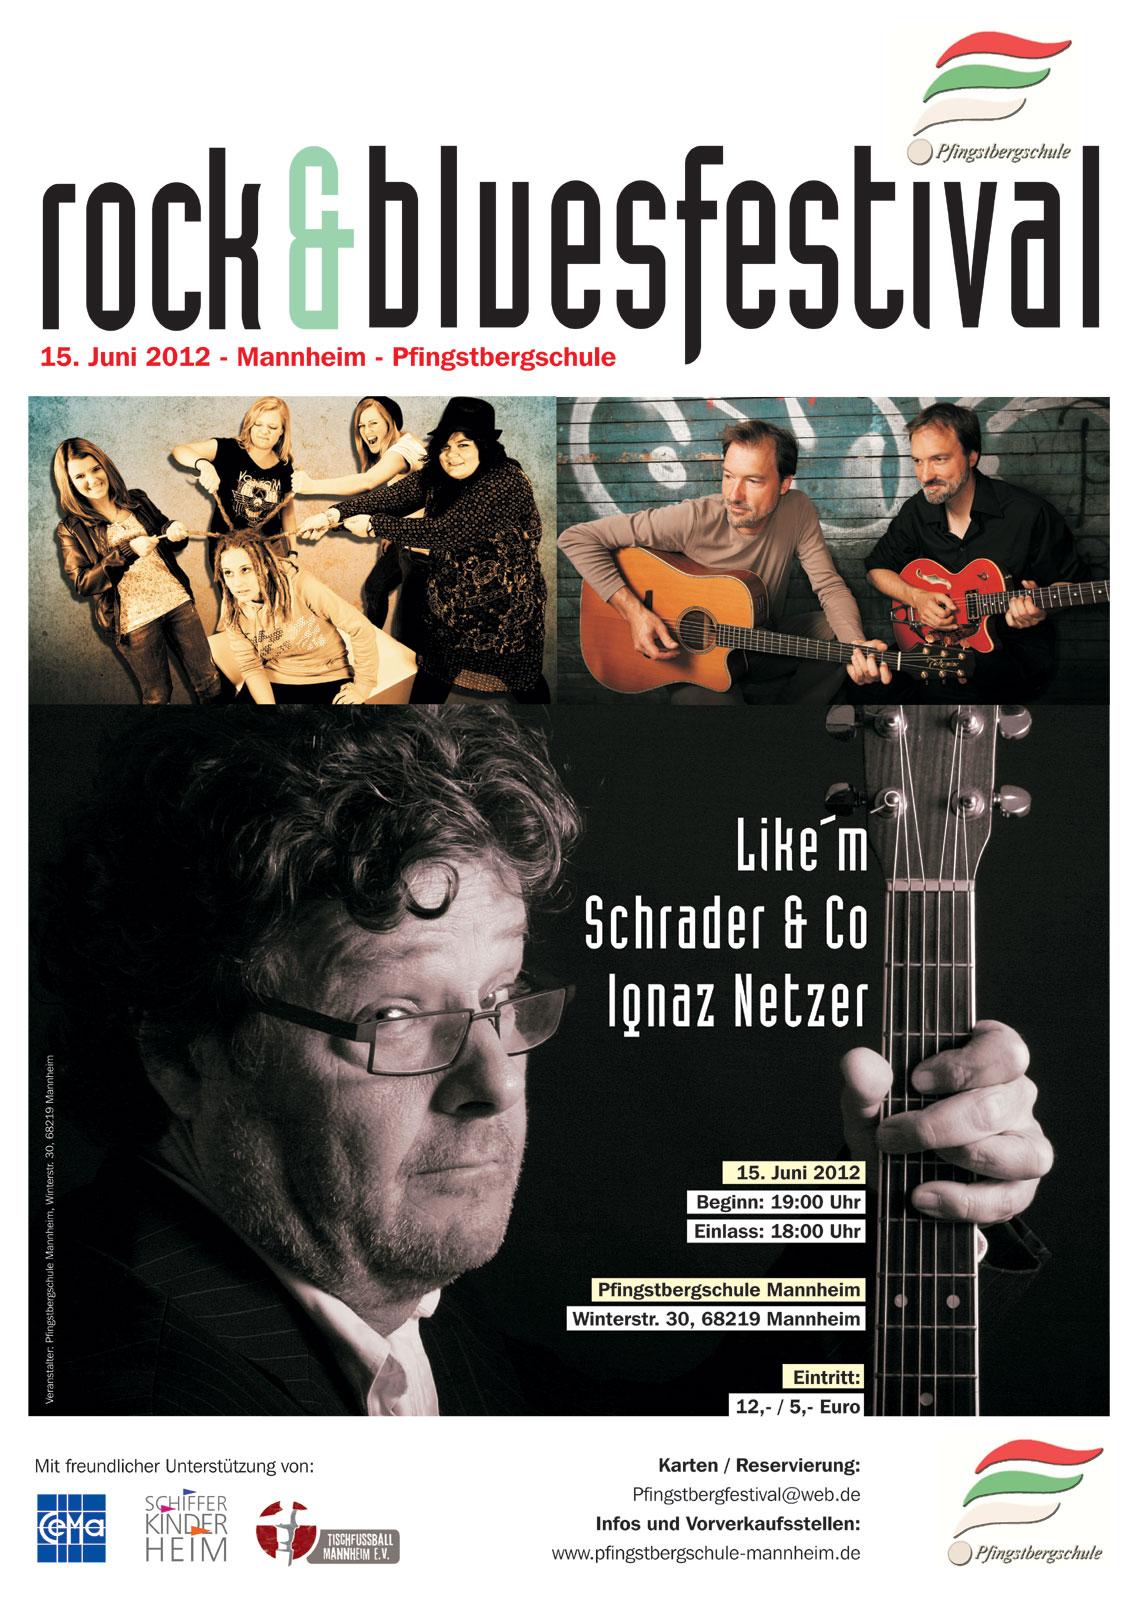 Premiere Pfingstberg Rock Und Bluesfestival Mannheim